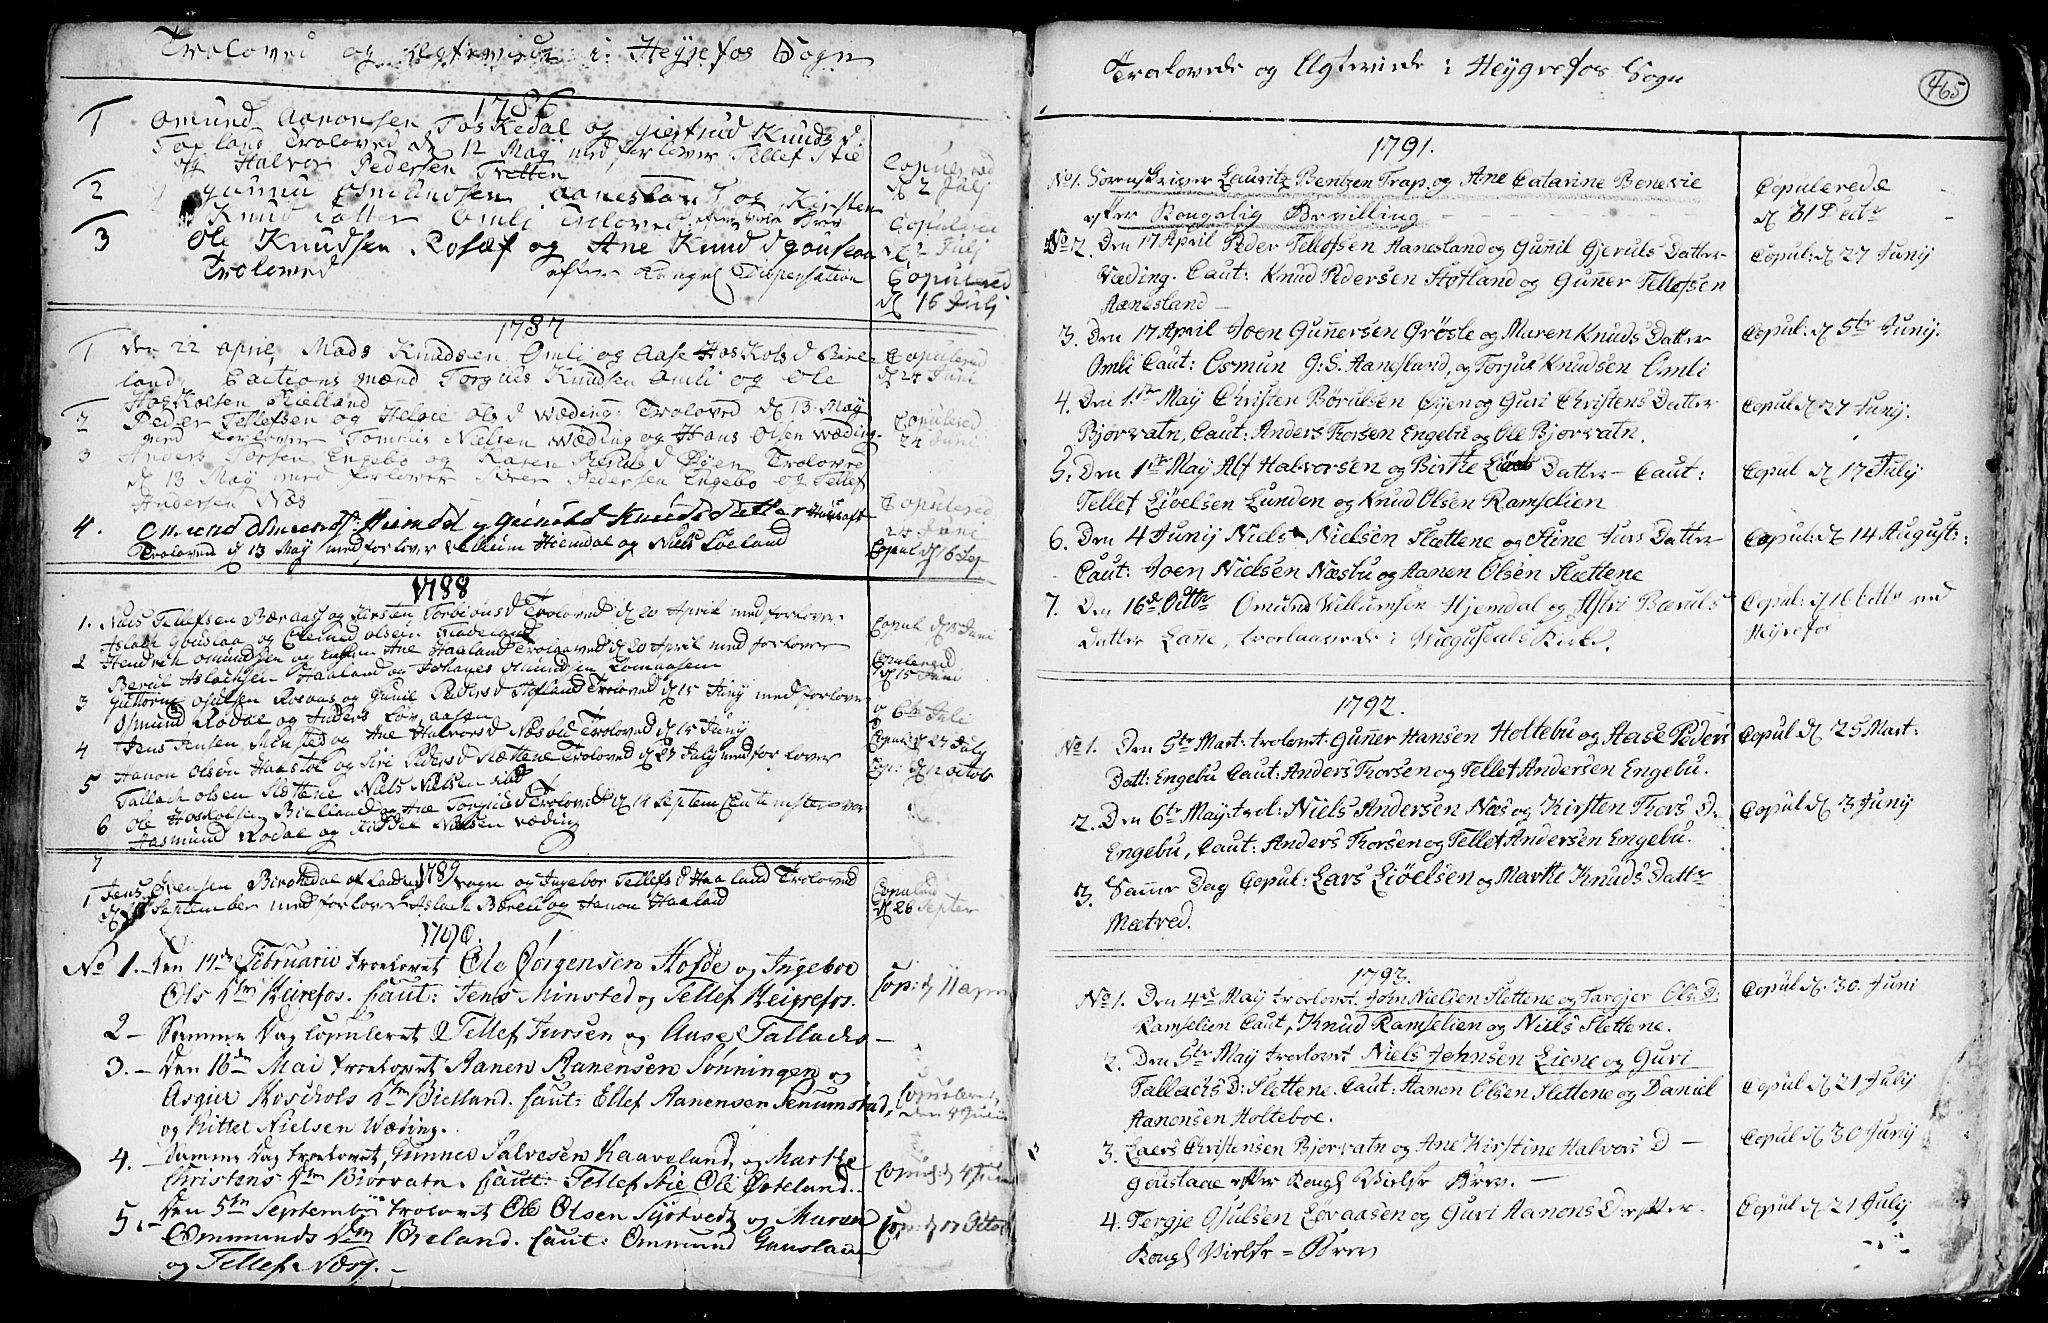 SAK, Hommedal sokneprestkontor, F/Fa/Fab/L0002: Ministerialbok nr. A 2 /3, 1740-1821, s. 465